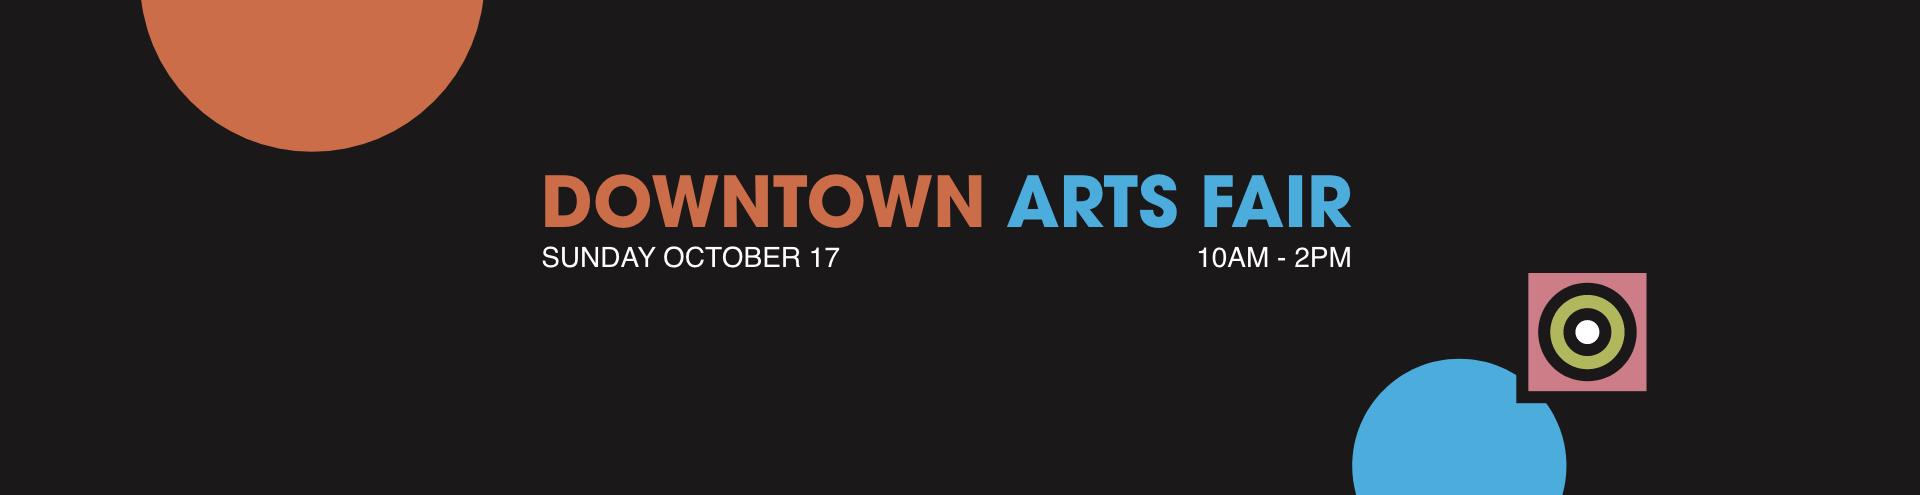 Downtown Arts Fair, October 17, 10AM - 2PM